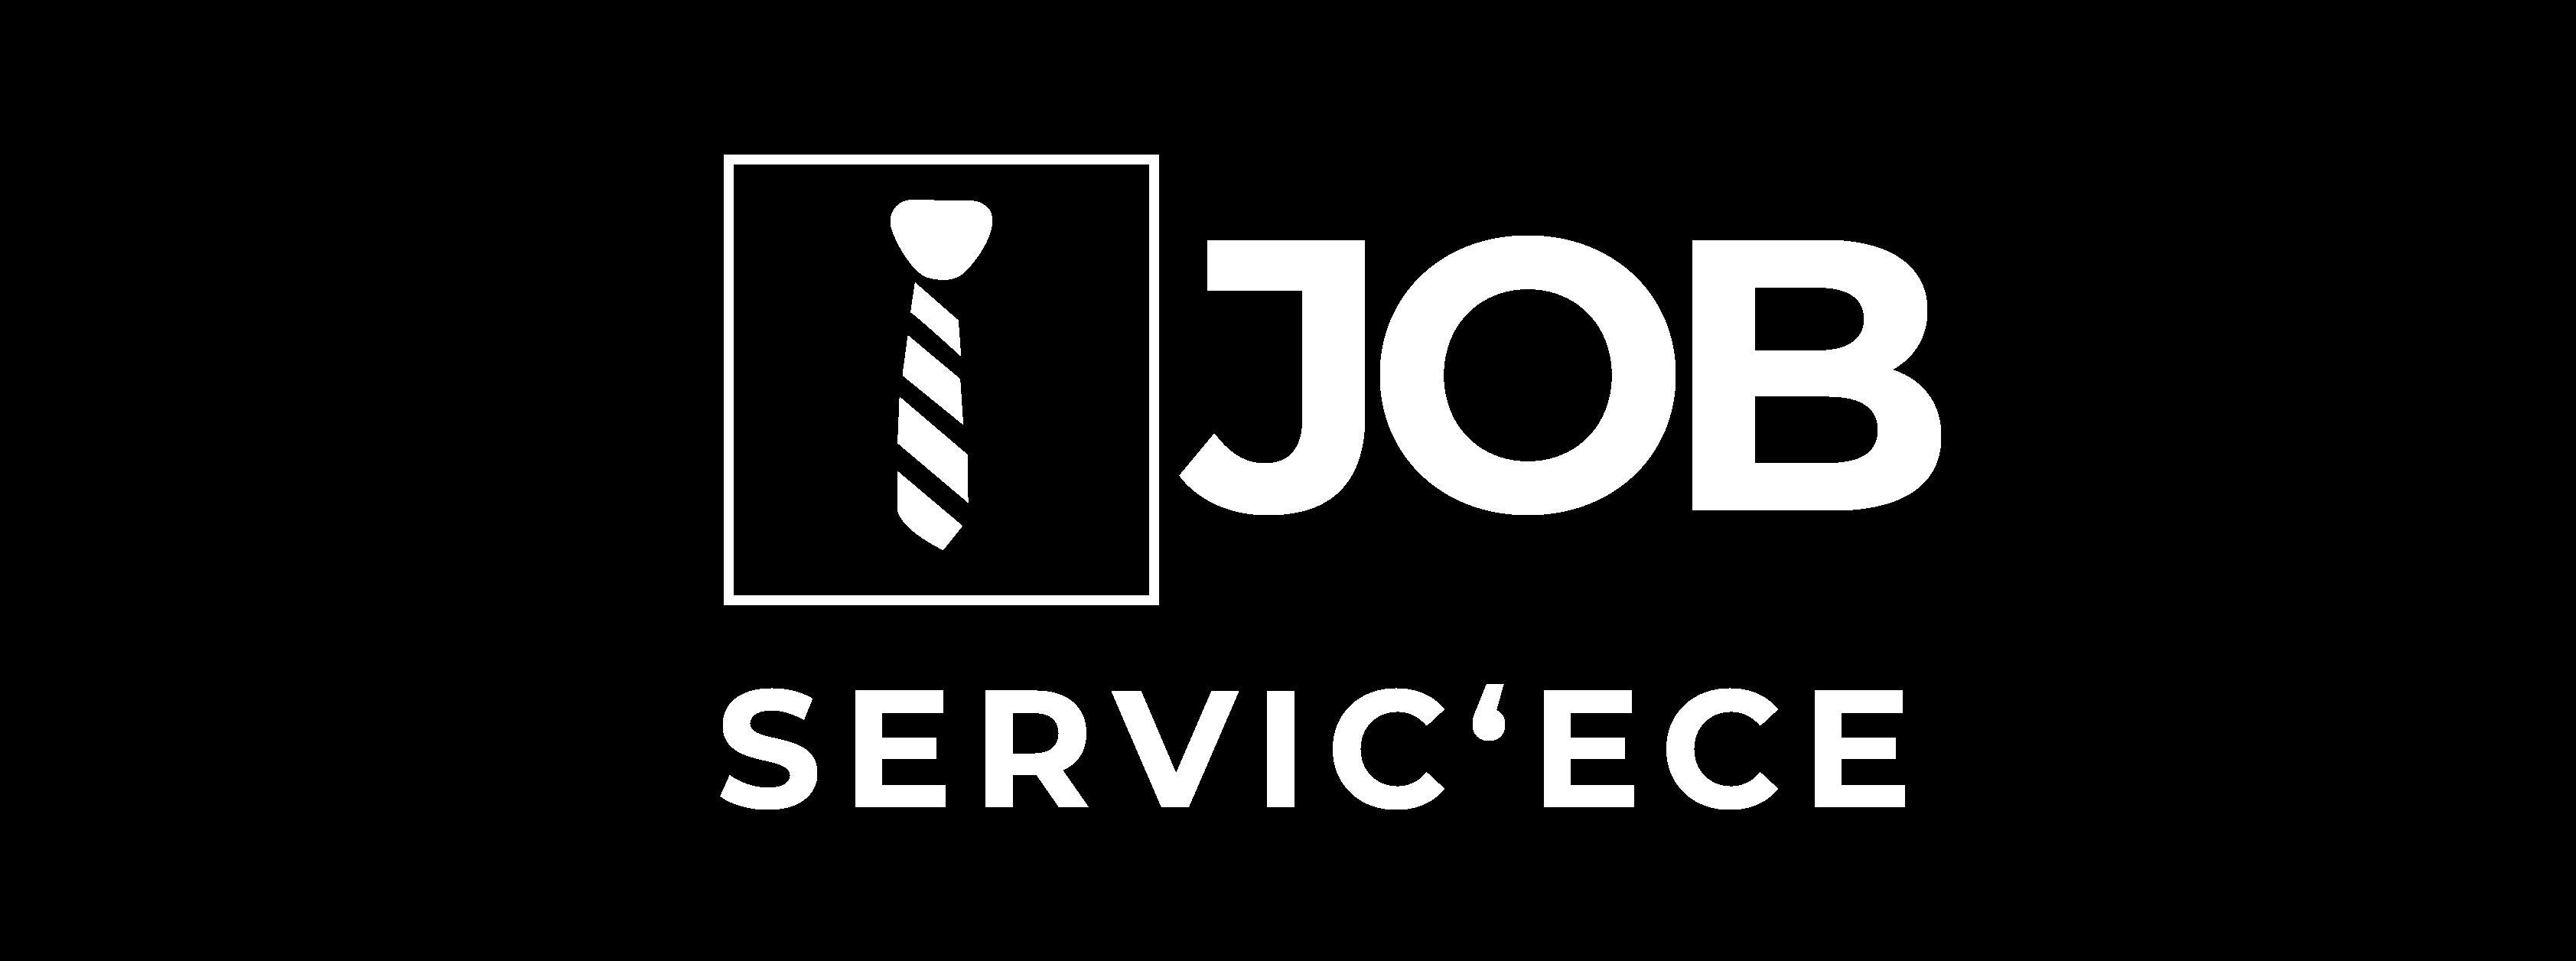 Logo Job Service